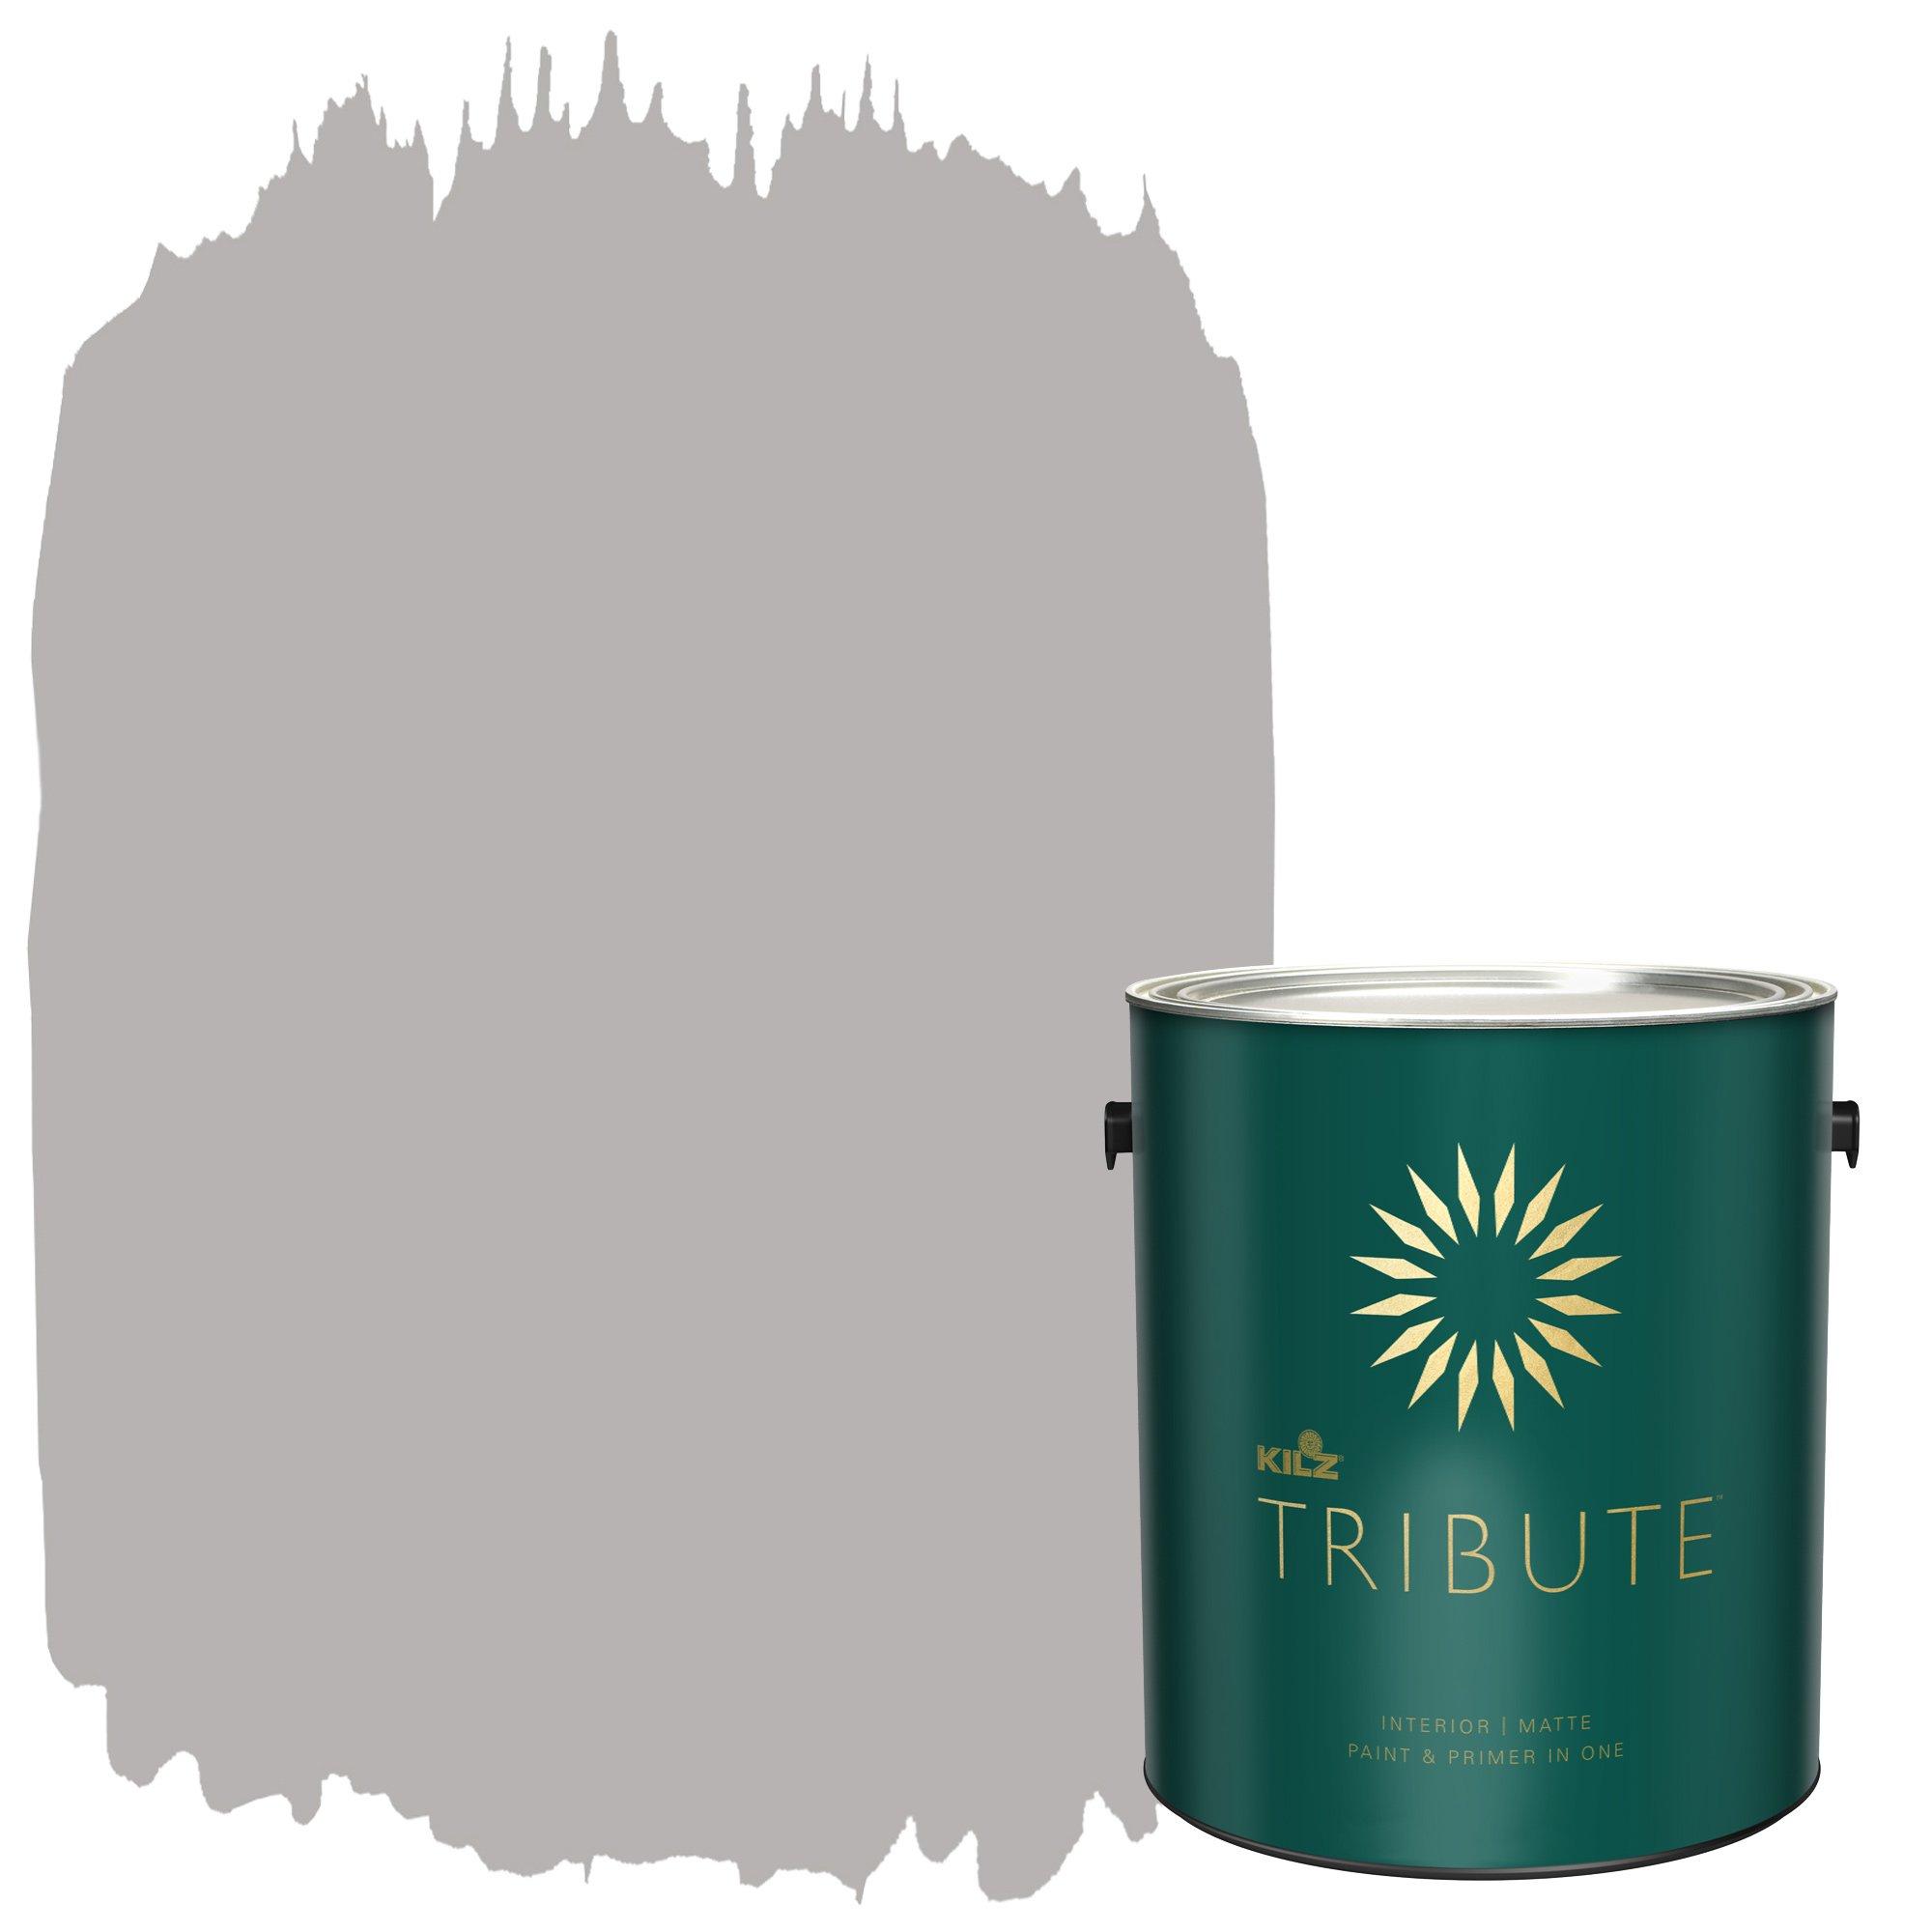 KILZ TRIBUTE Interior Matte Paint and Primer in One, 1 Gallon, Postcard (TB-25)